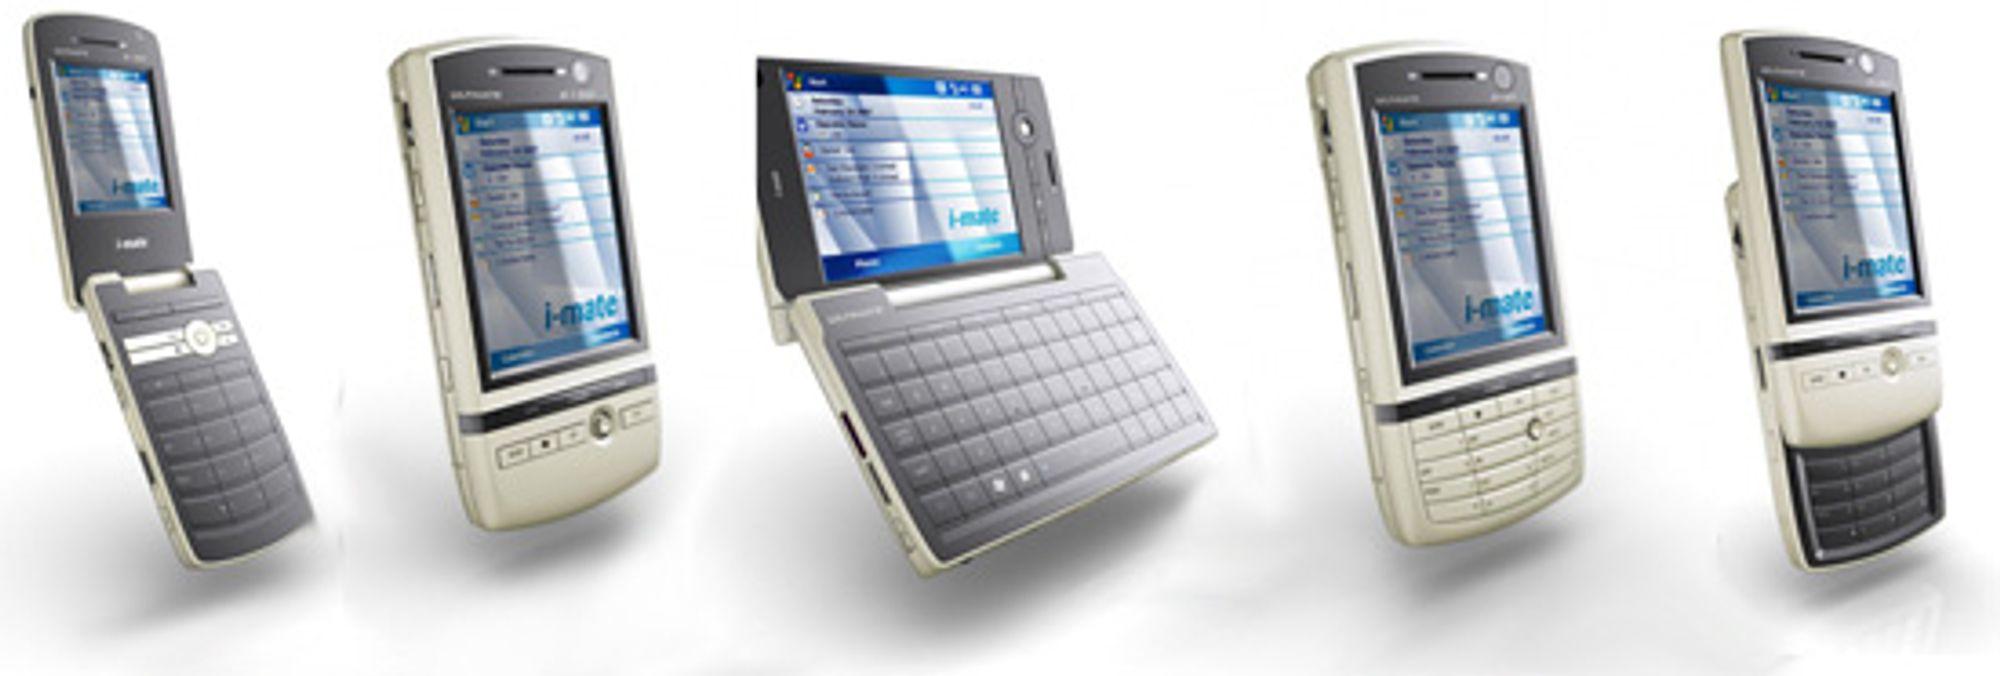 Fra venstre: 9150, 6150, 7150, 8150 og 5150 (Bilder: Engadget Mobile)